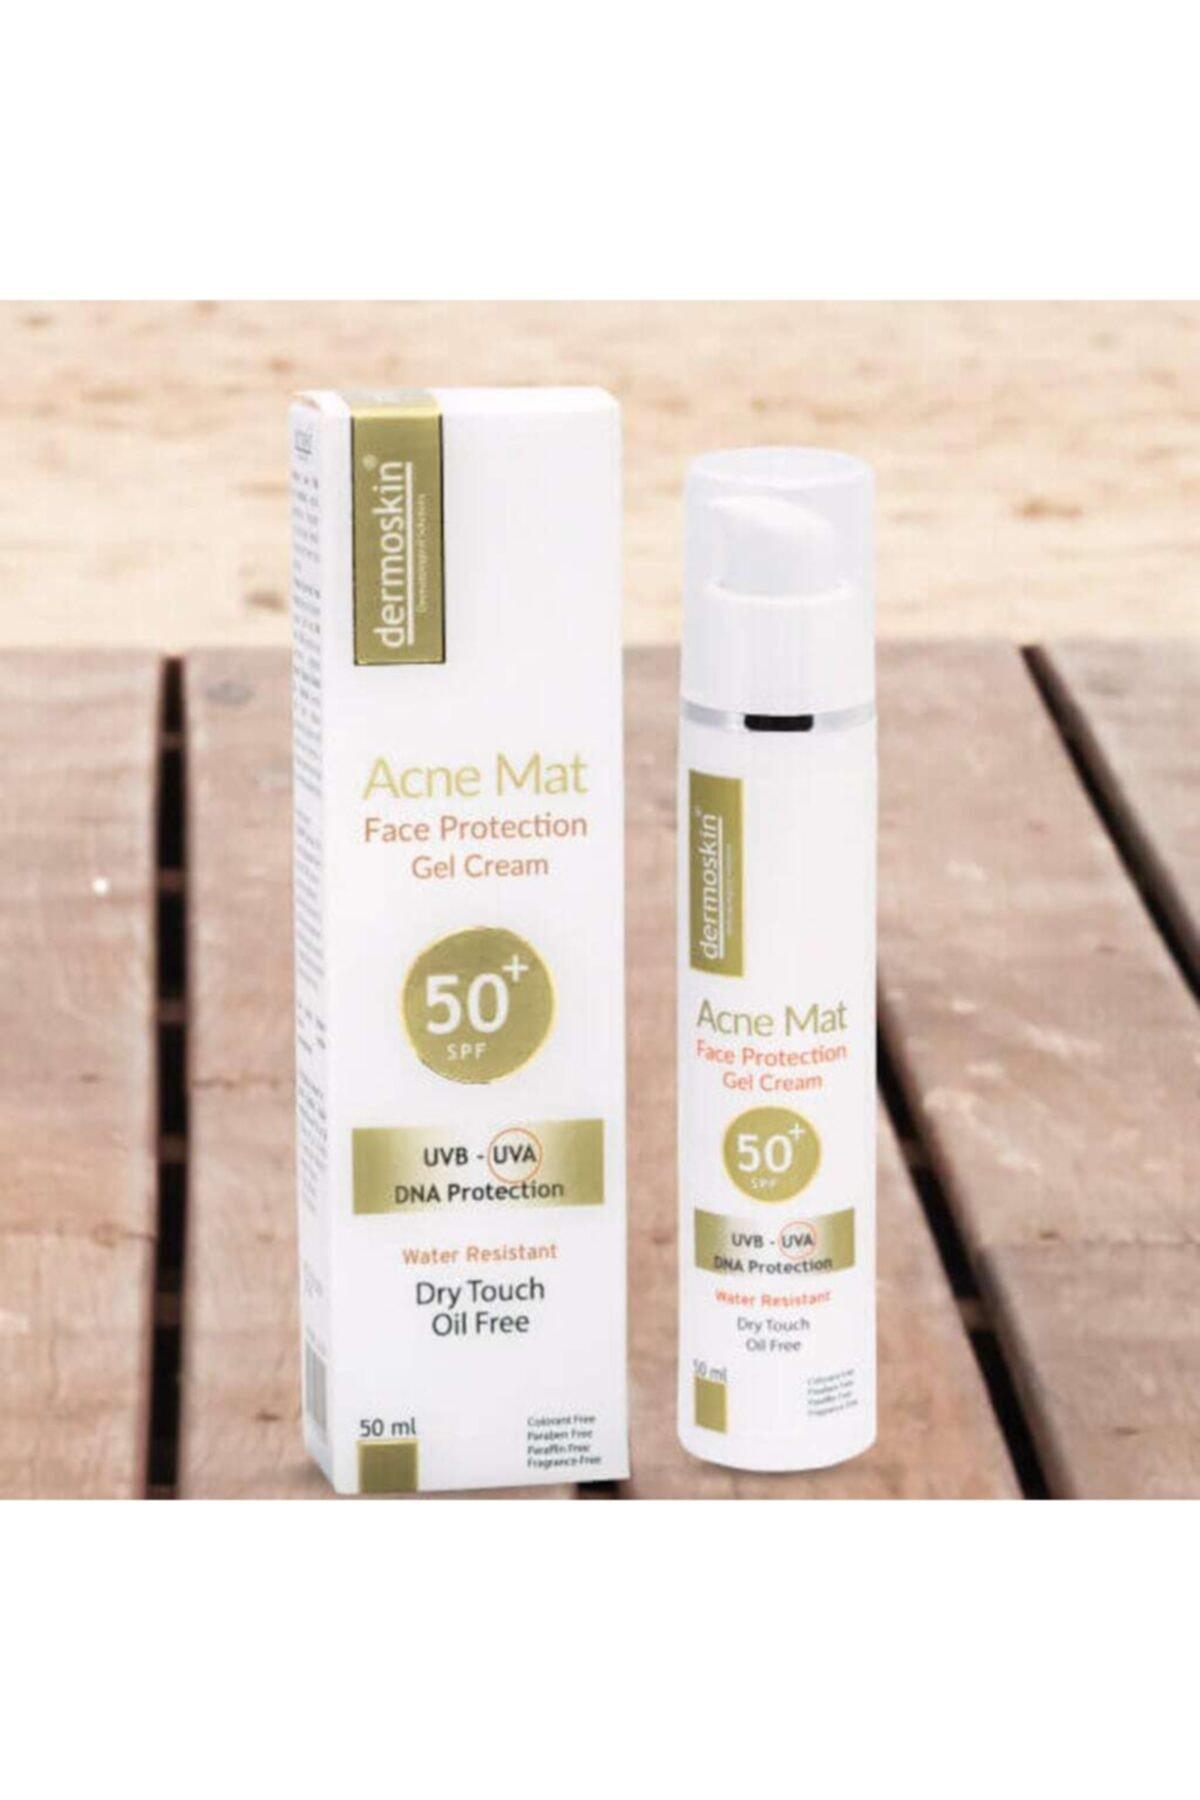 Acne Mat Face Protection Gel Cream Spf50 Skt:03/2021